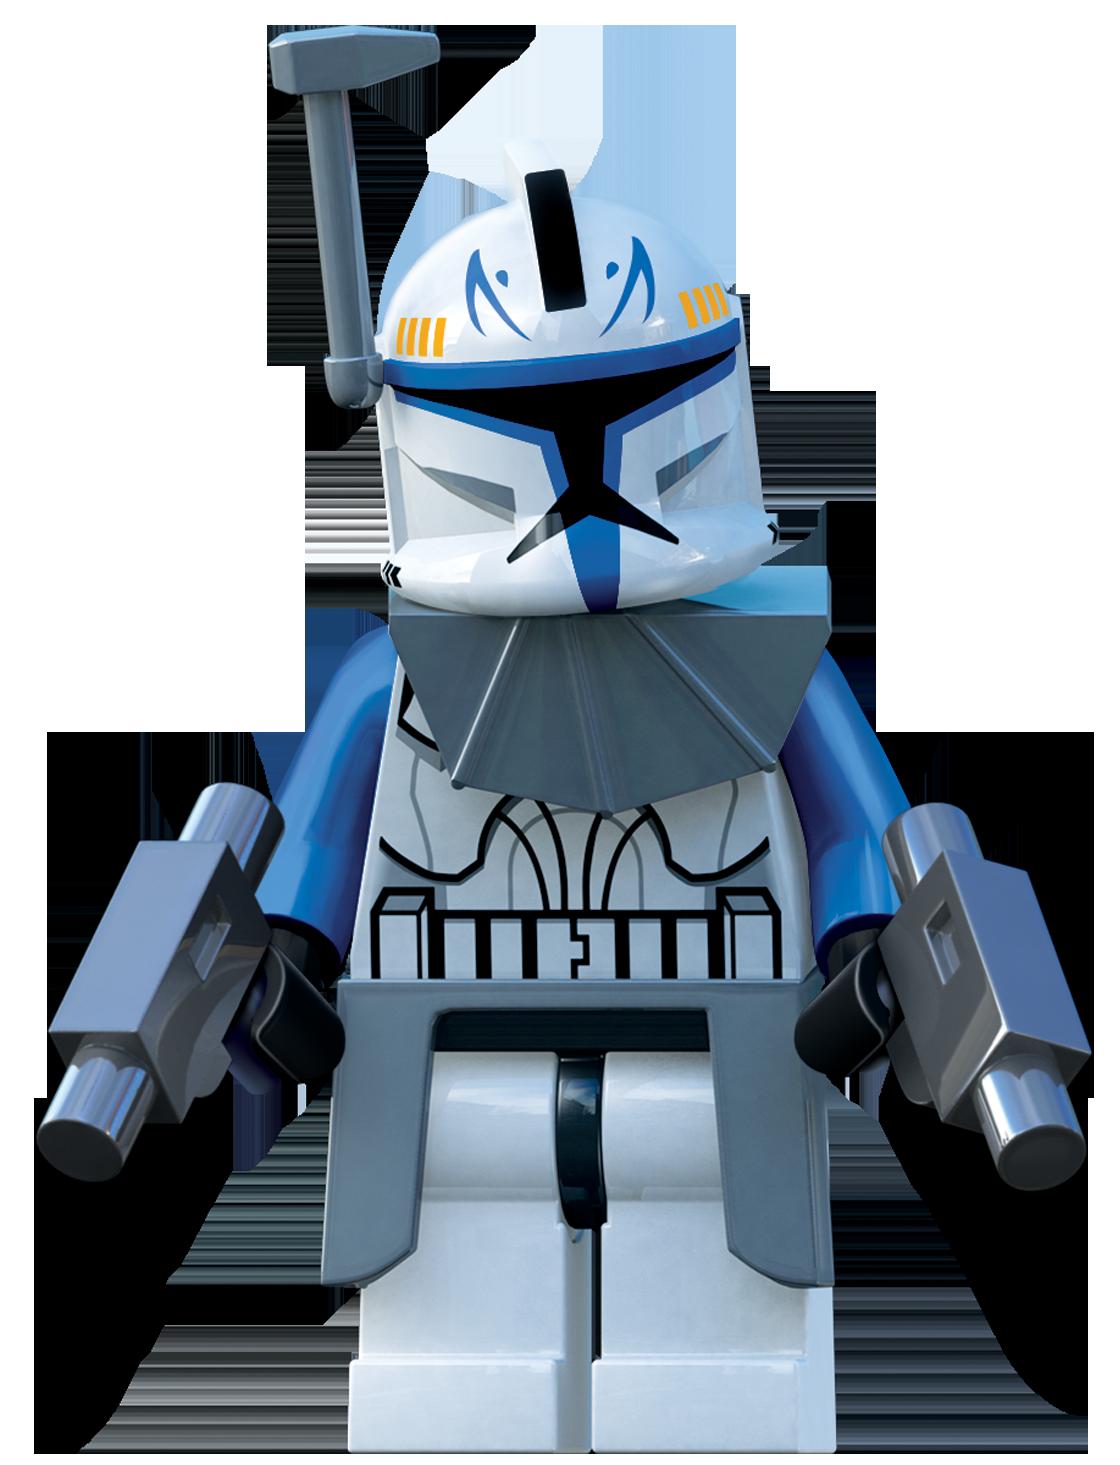 Rex In Lego Star Wars Iii Clone Captain Rex Star Wars Star